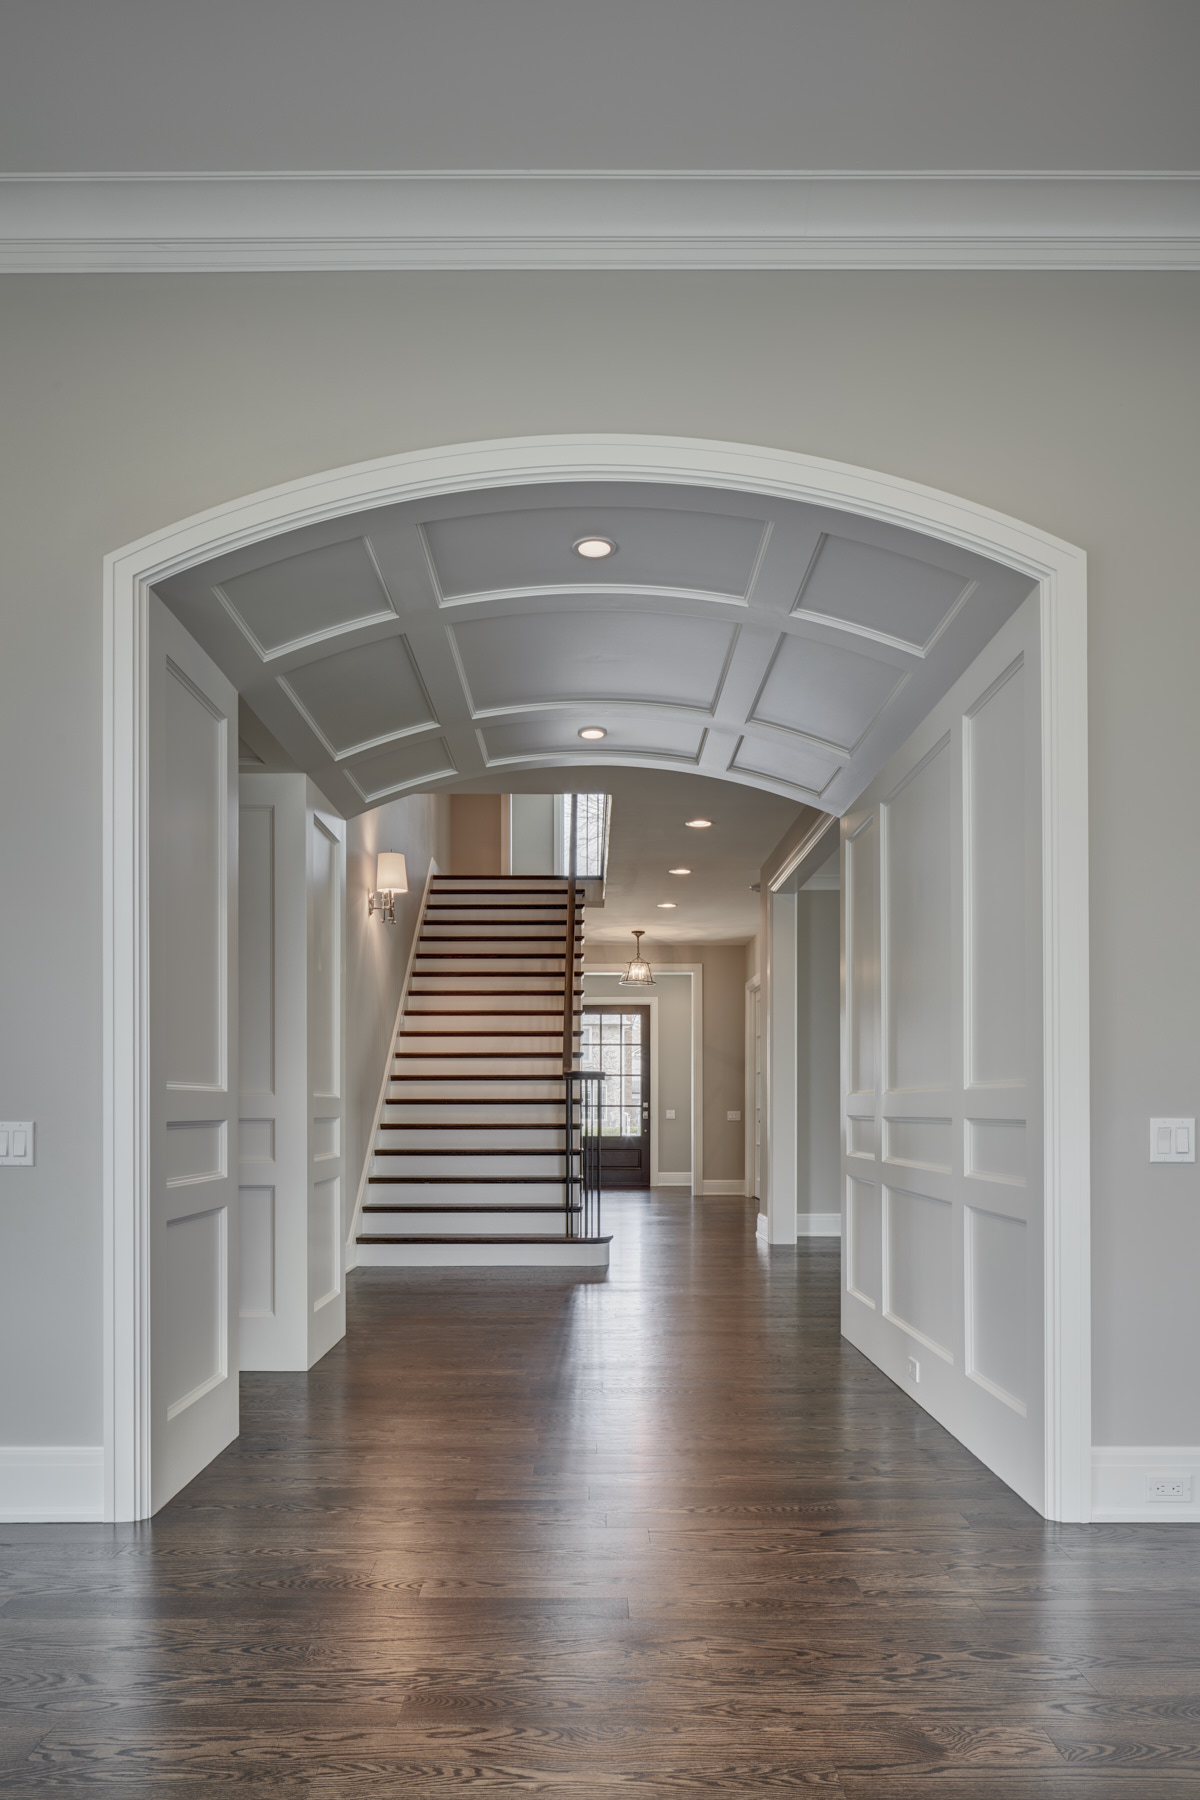 634 Glenhurst-HM Homes-4-12-17-Foyer Arch 1-8bitTIFF.jpg